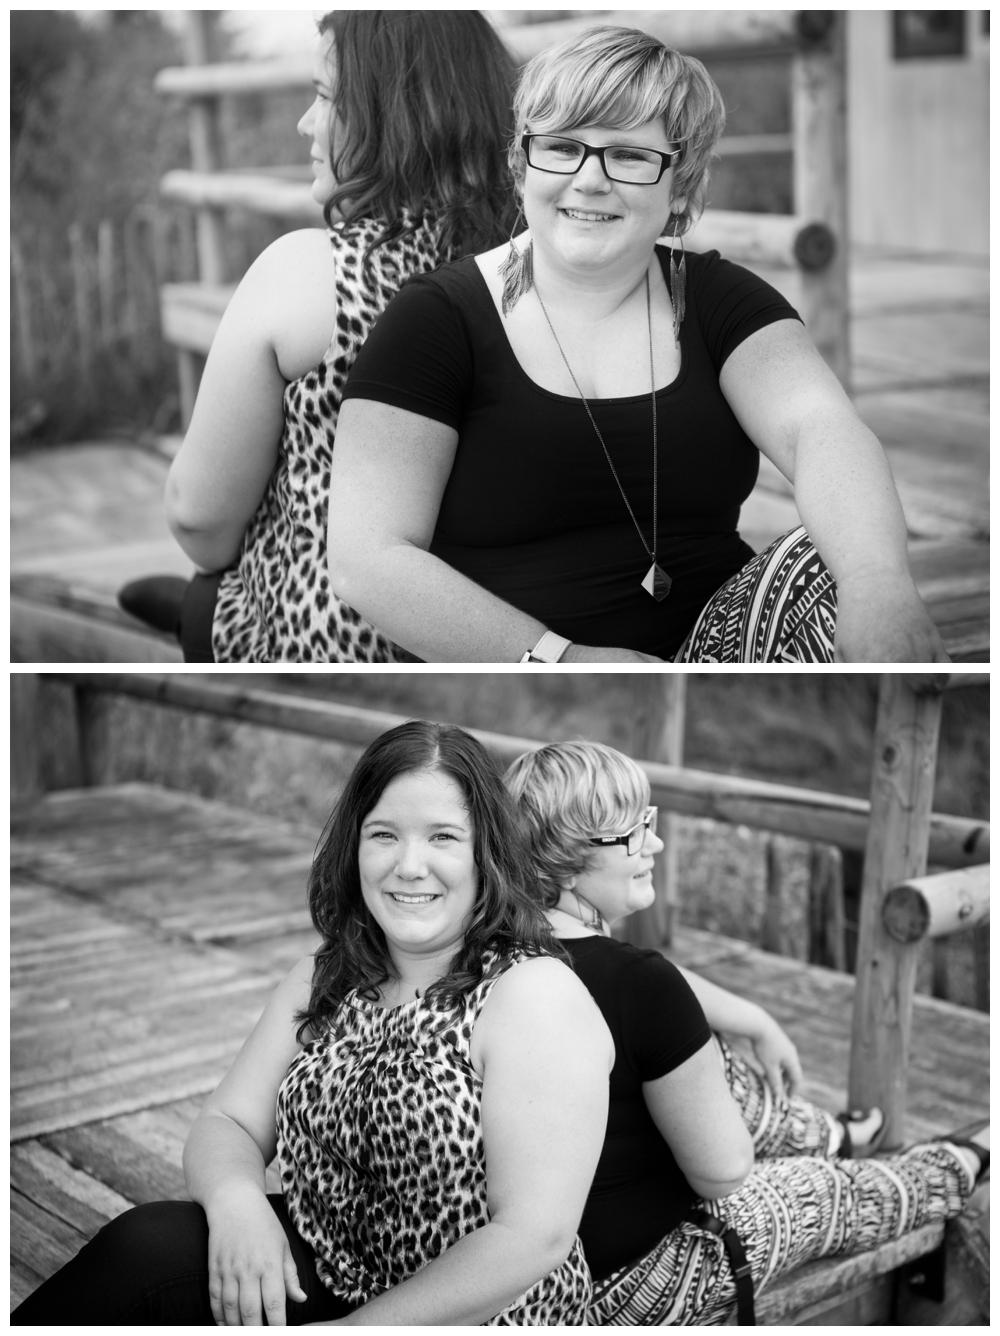 Portretshoot Myrthe&Martine ZW39.jpg